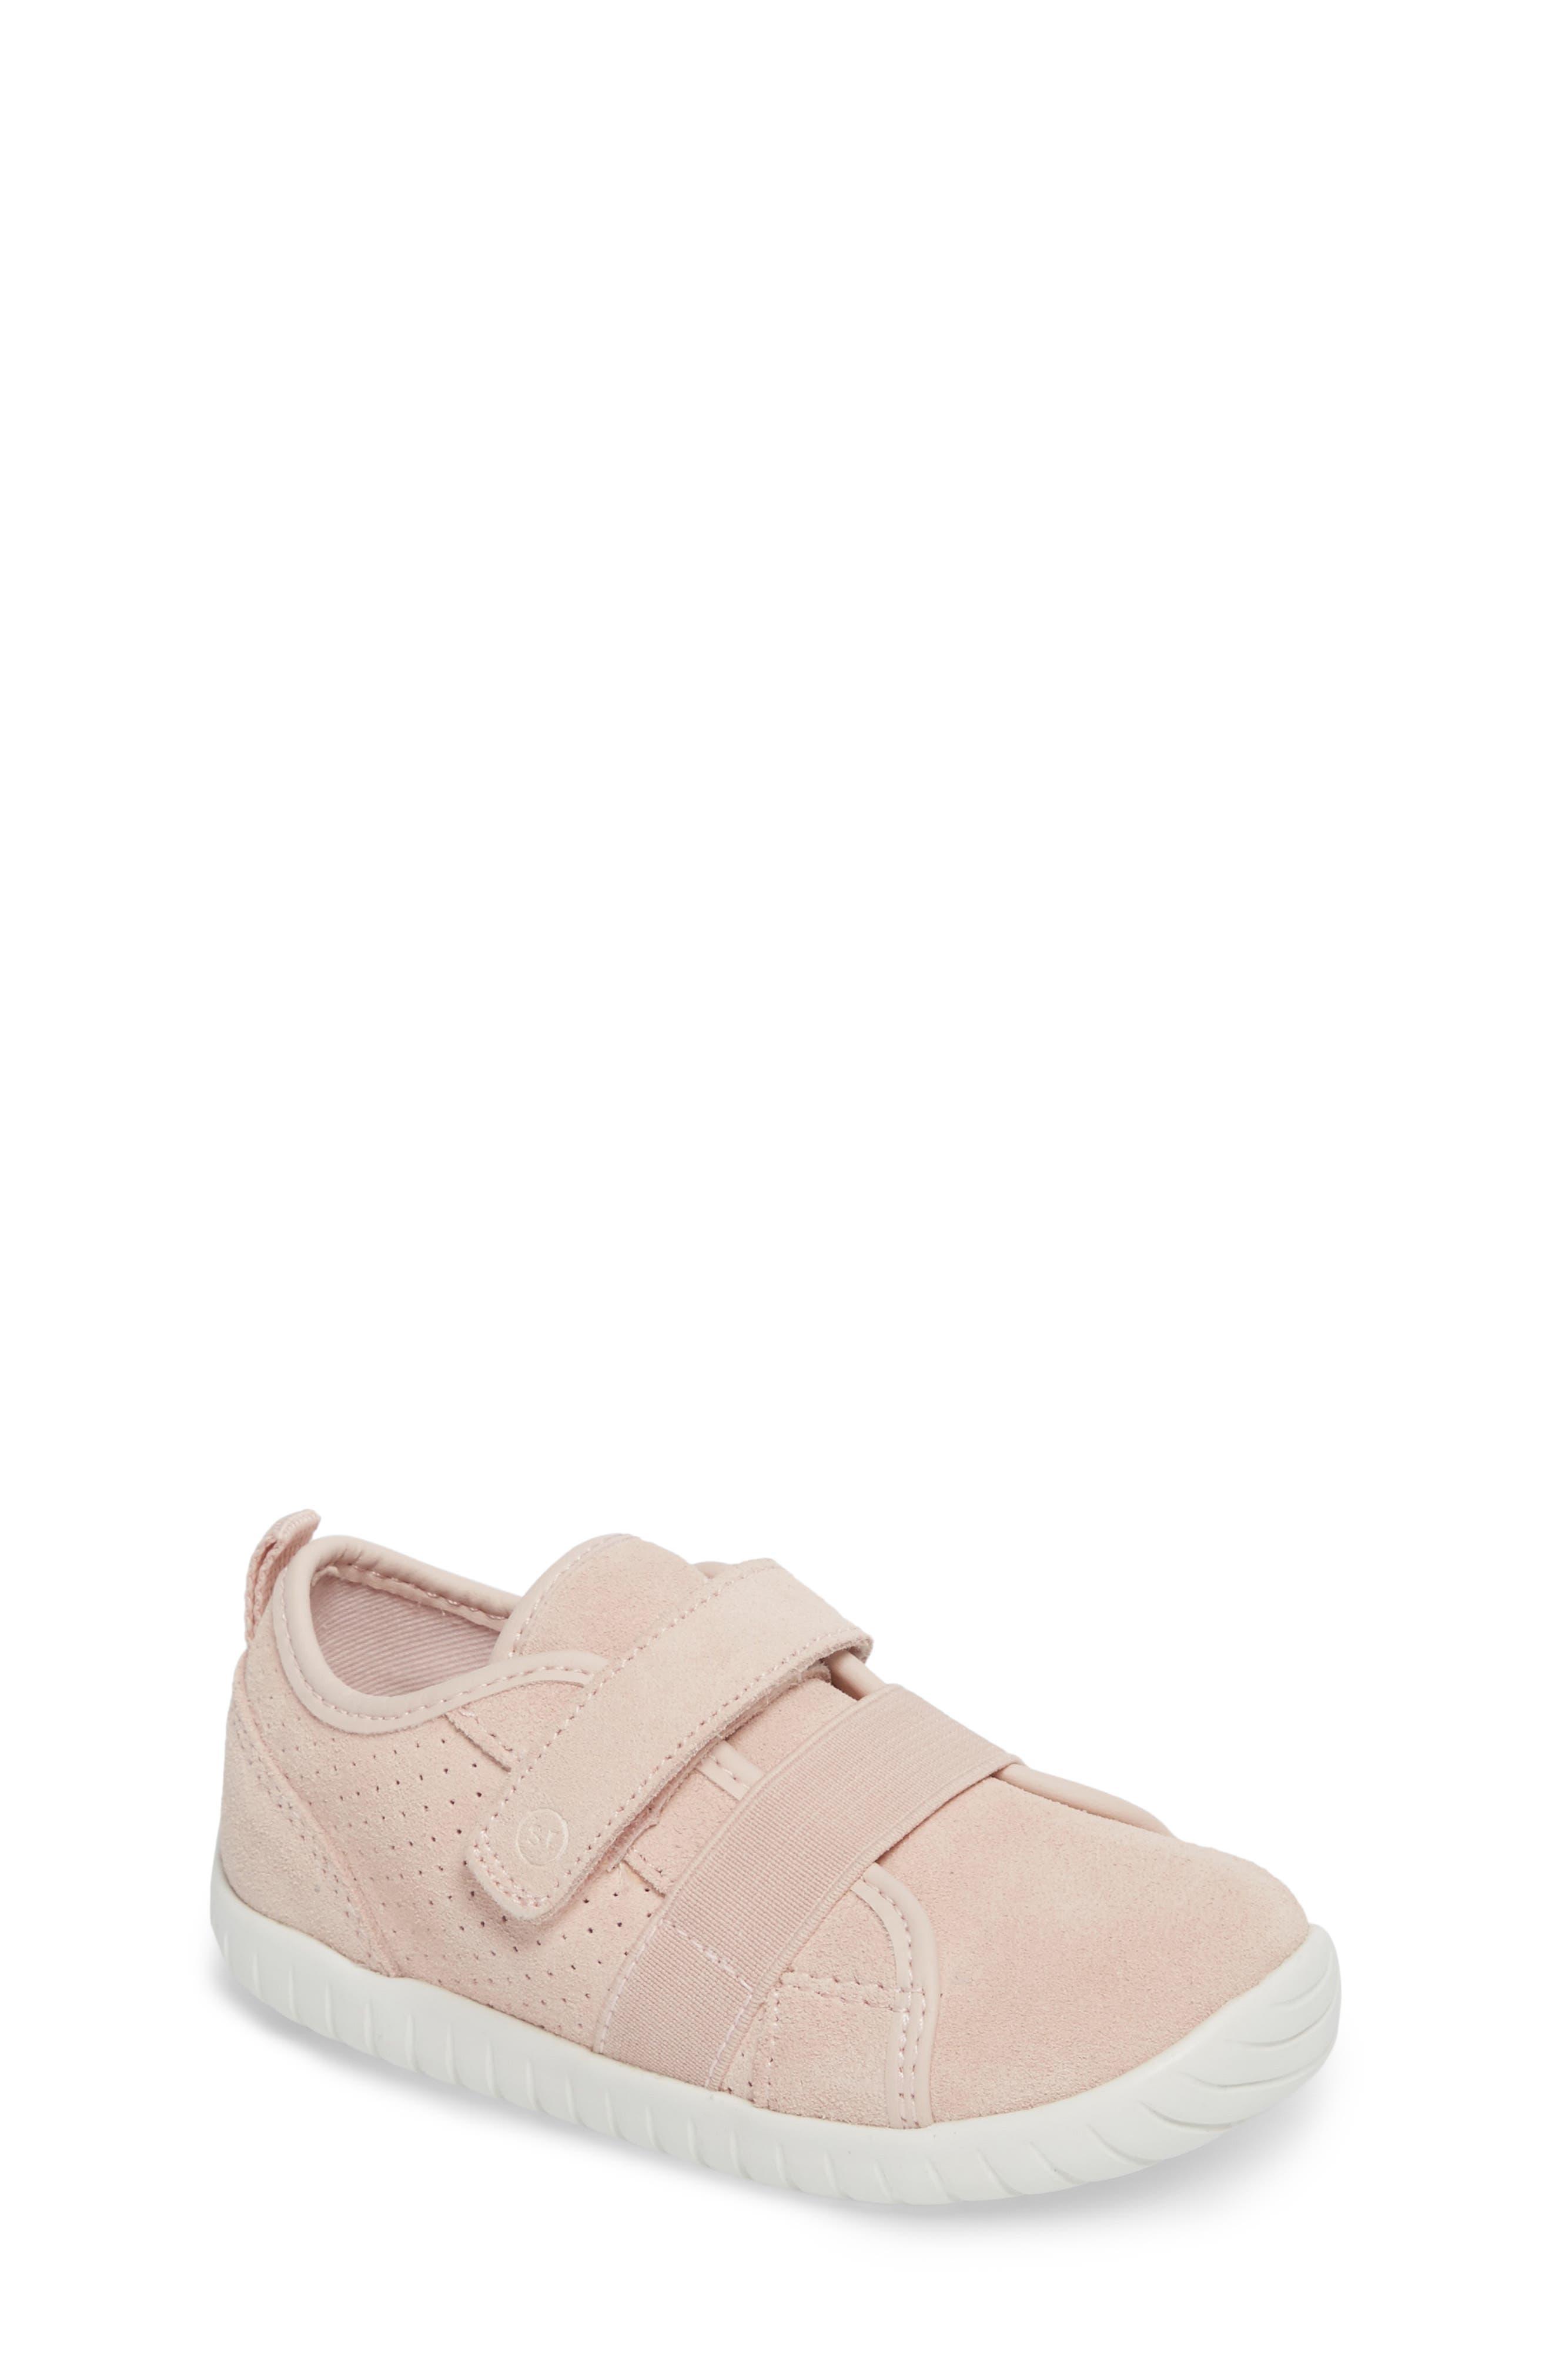 SRtech<sup>™</sup> Riley Sneaker,                         Main,                         color, Blush Leather